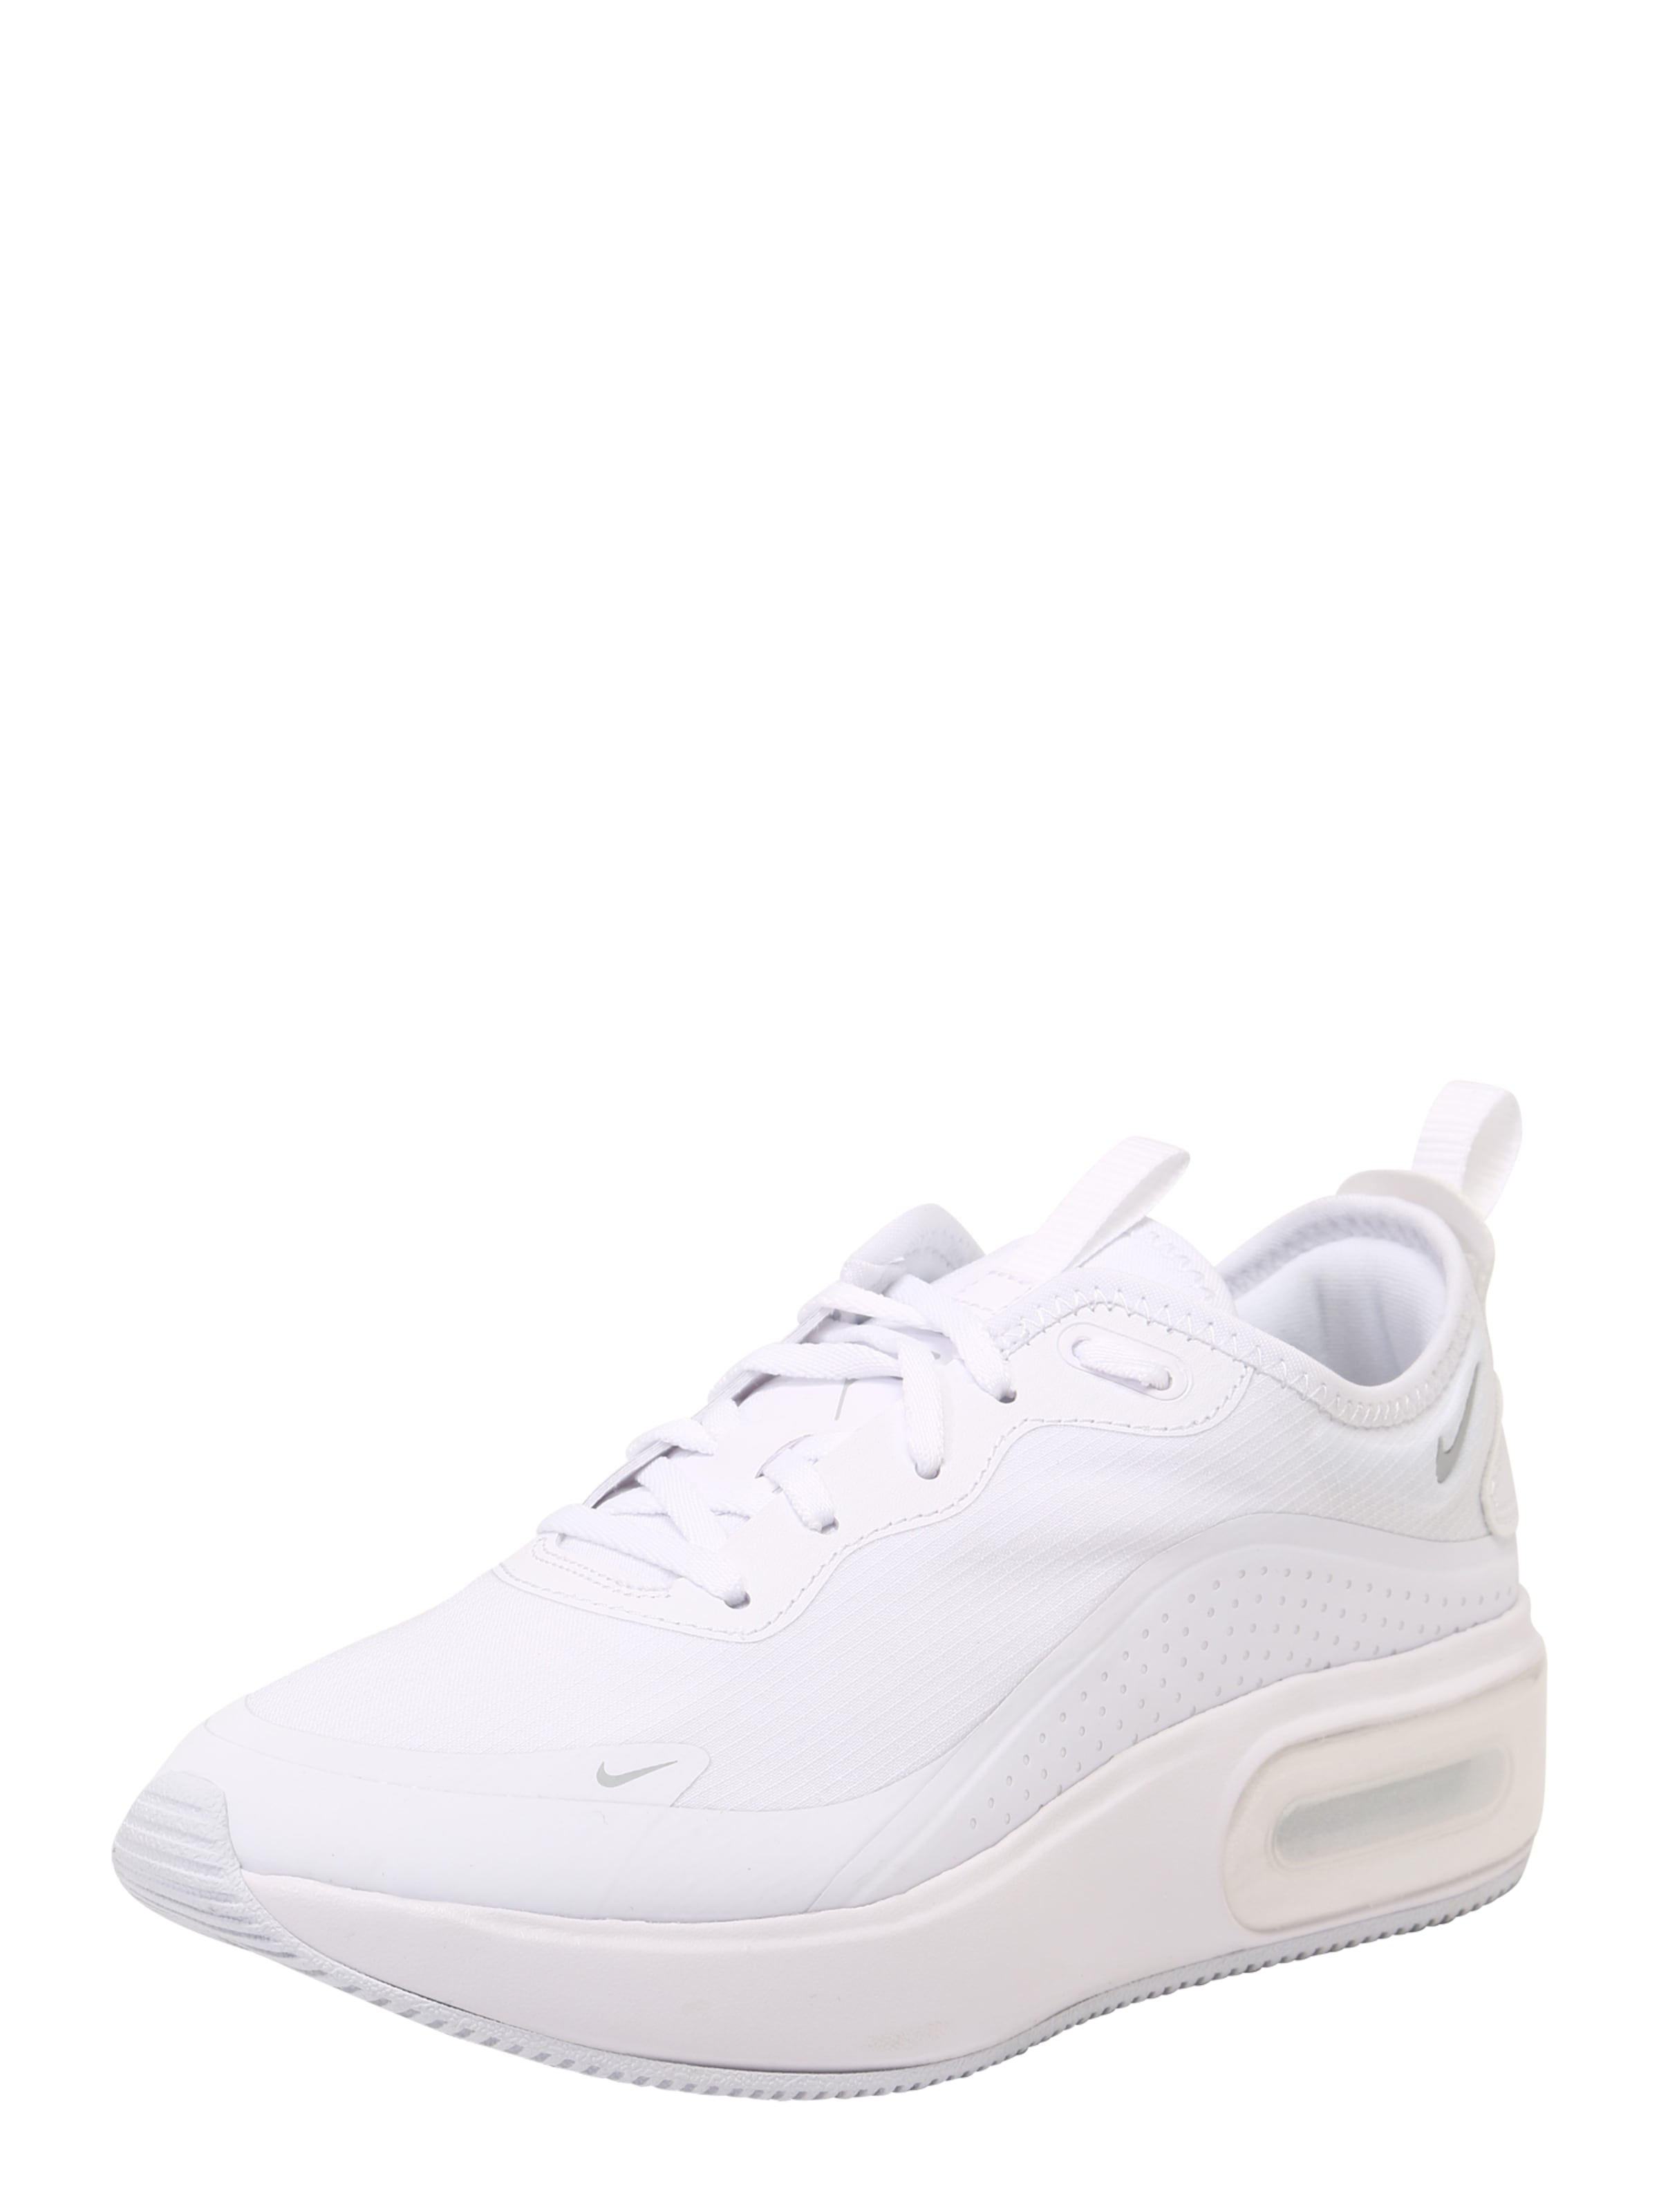 Max Weiß Dia' Air Nike In Sportswear Sneaker 'nike yPvmNn08wO